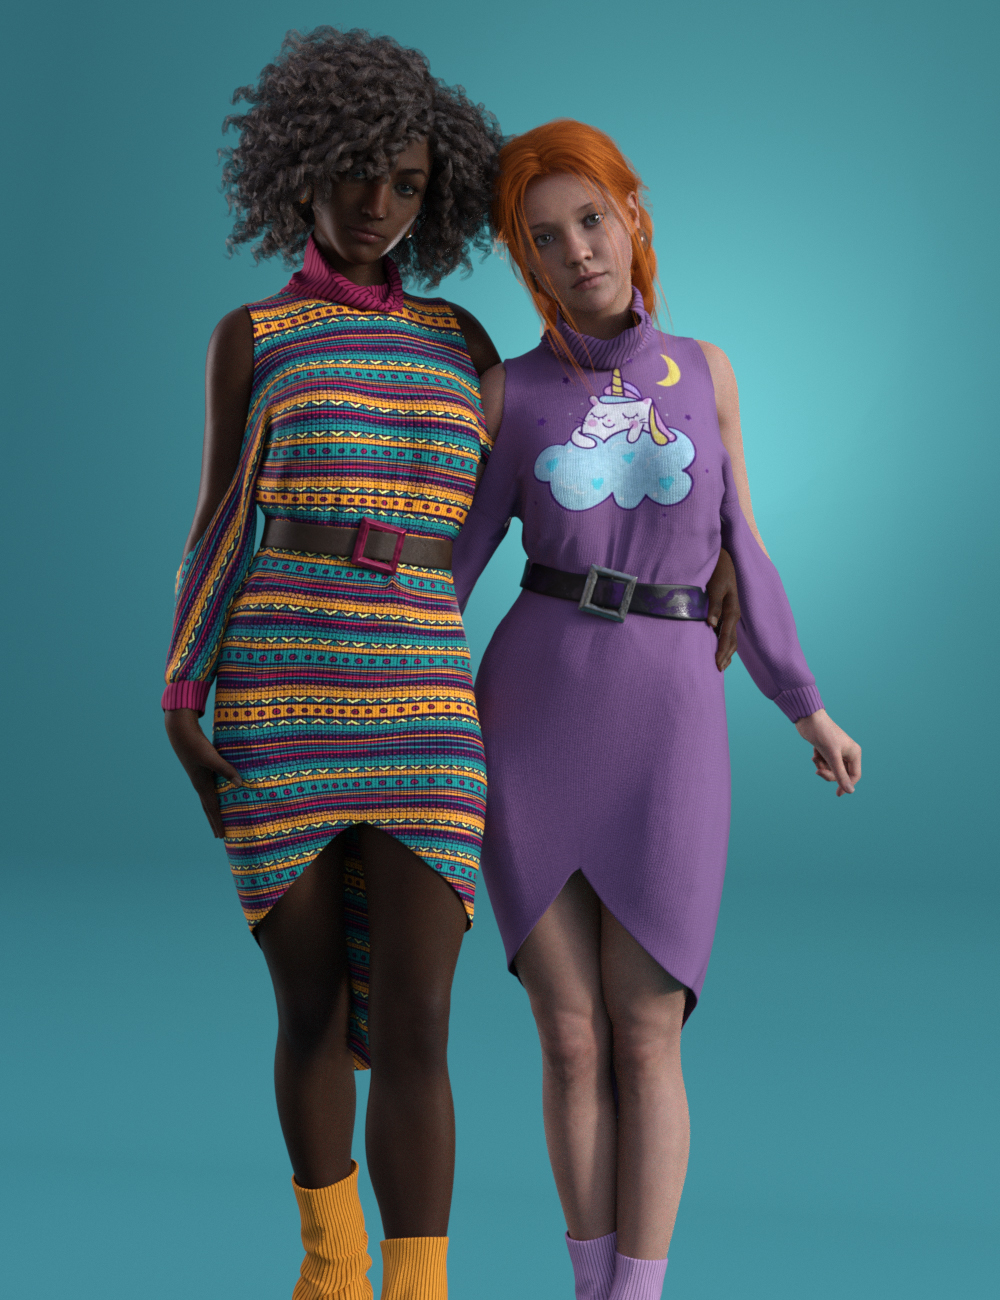 dForce Cold Shoulder: Graphic Knit Textures by: Moonscape GraphicsSade, 3D Models by Daz 3D